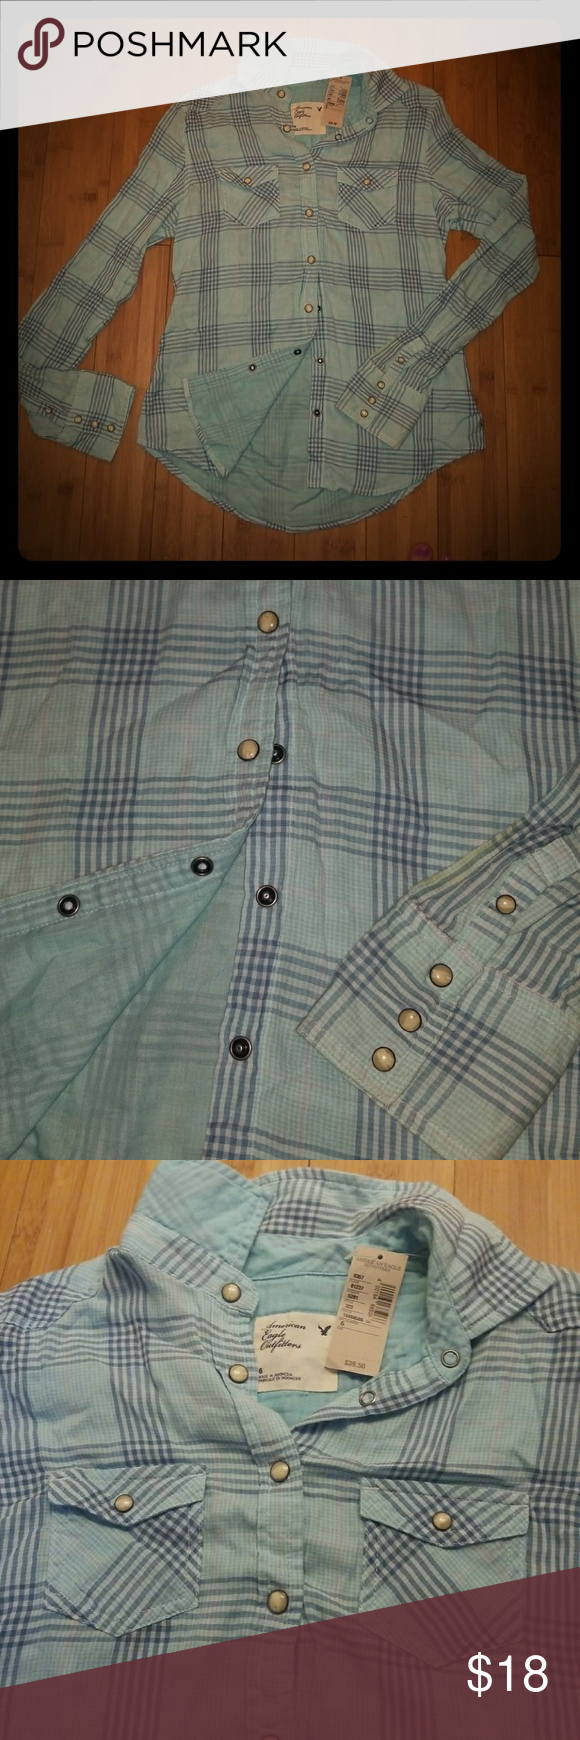 Light Plaidwestern Snap Button Dress Shirt Nwt In 2018 My Posh